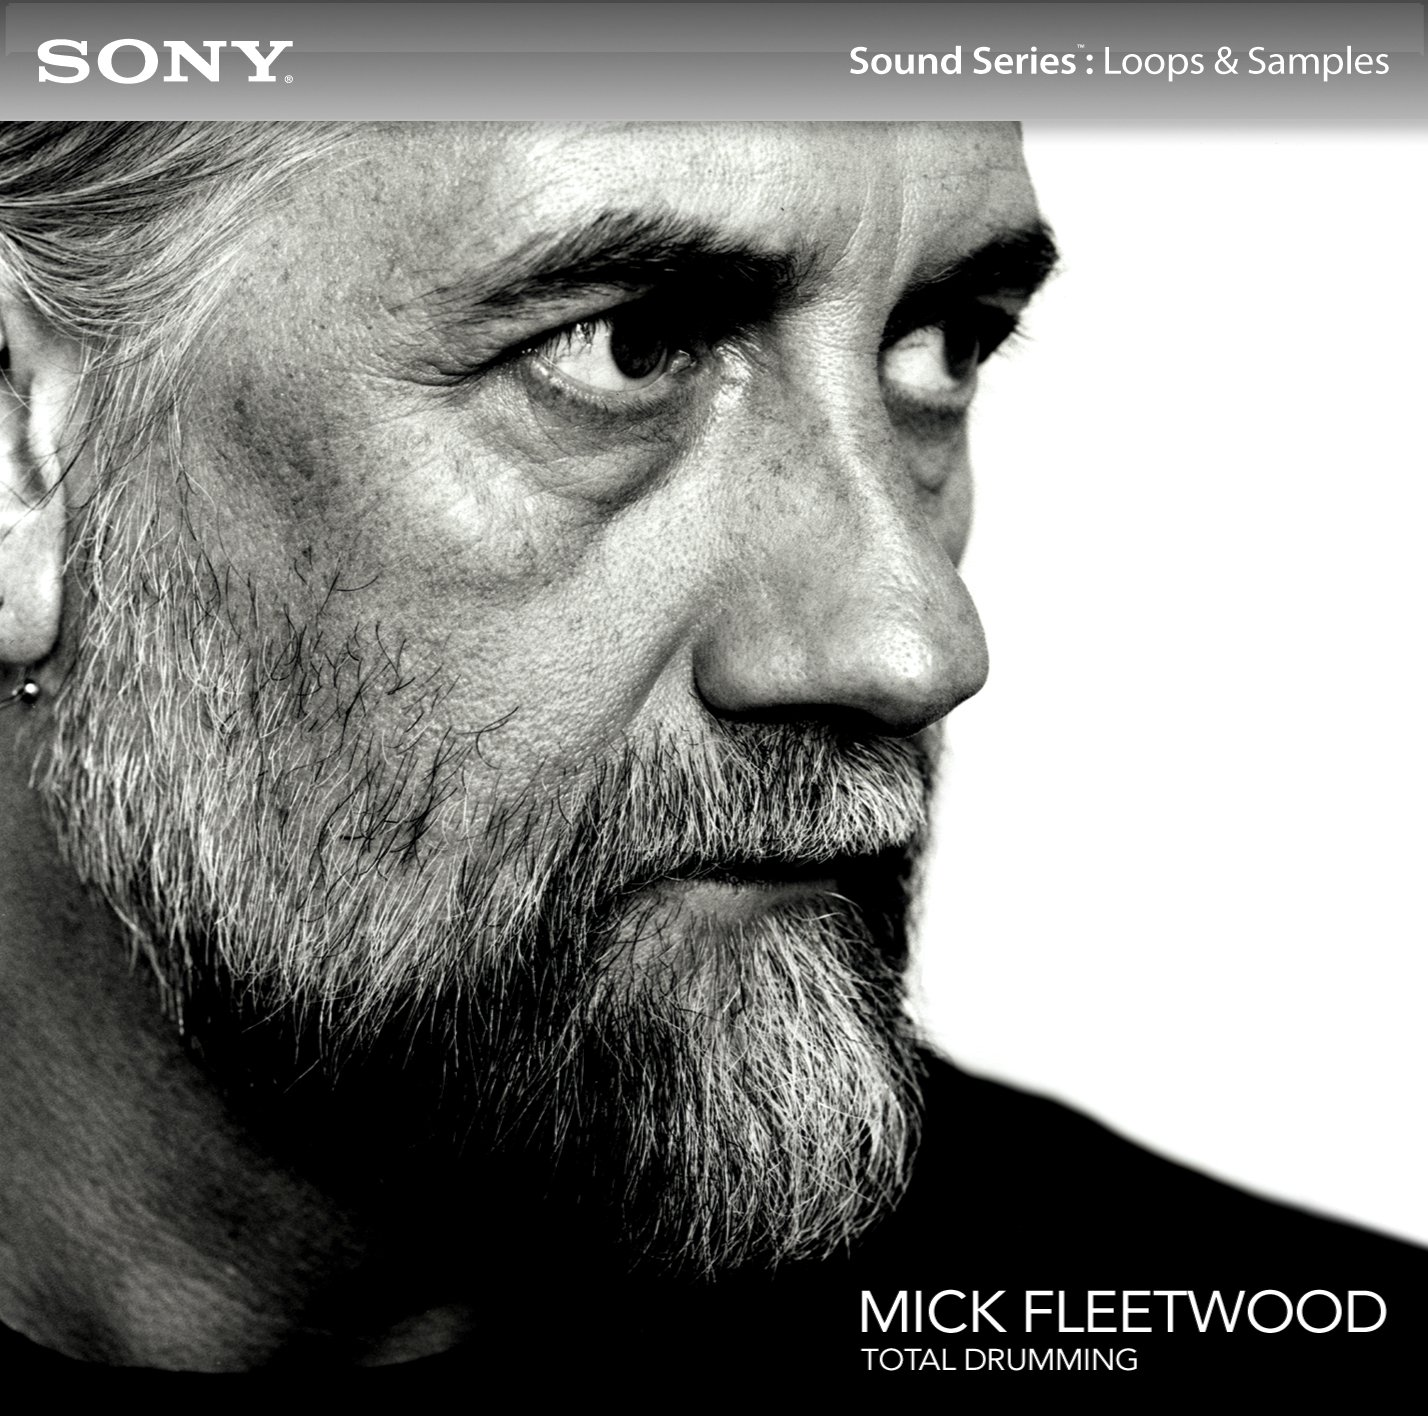 Download Mick Fleetwood Total Drumming